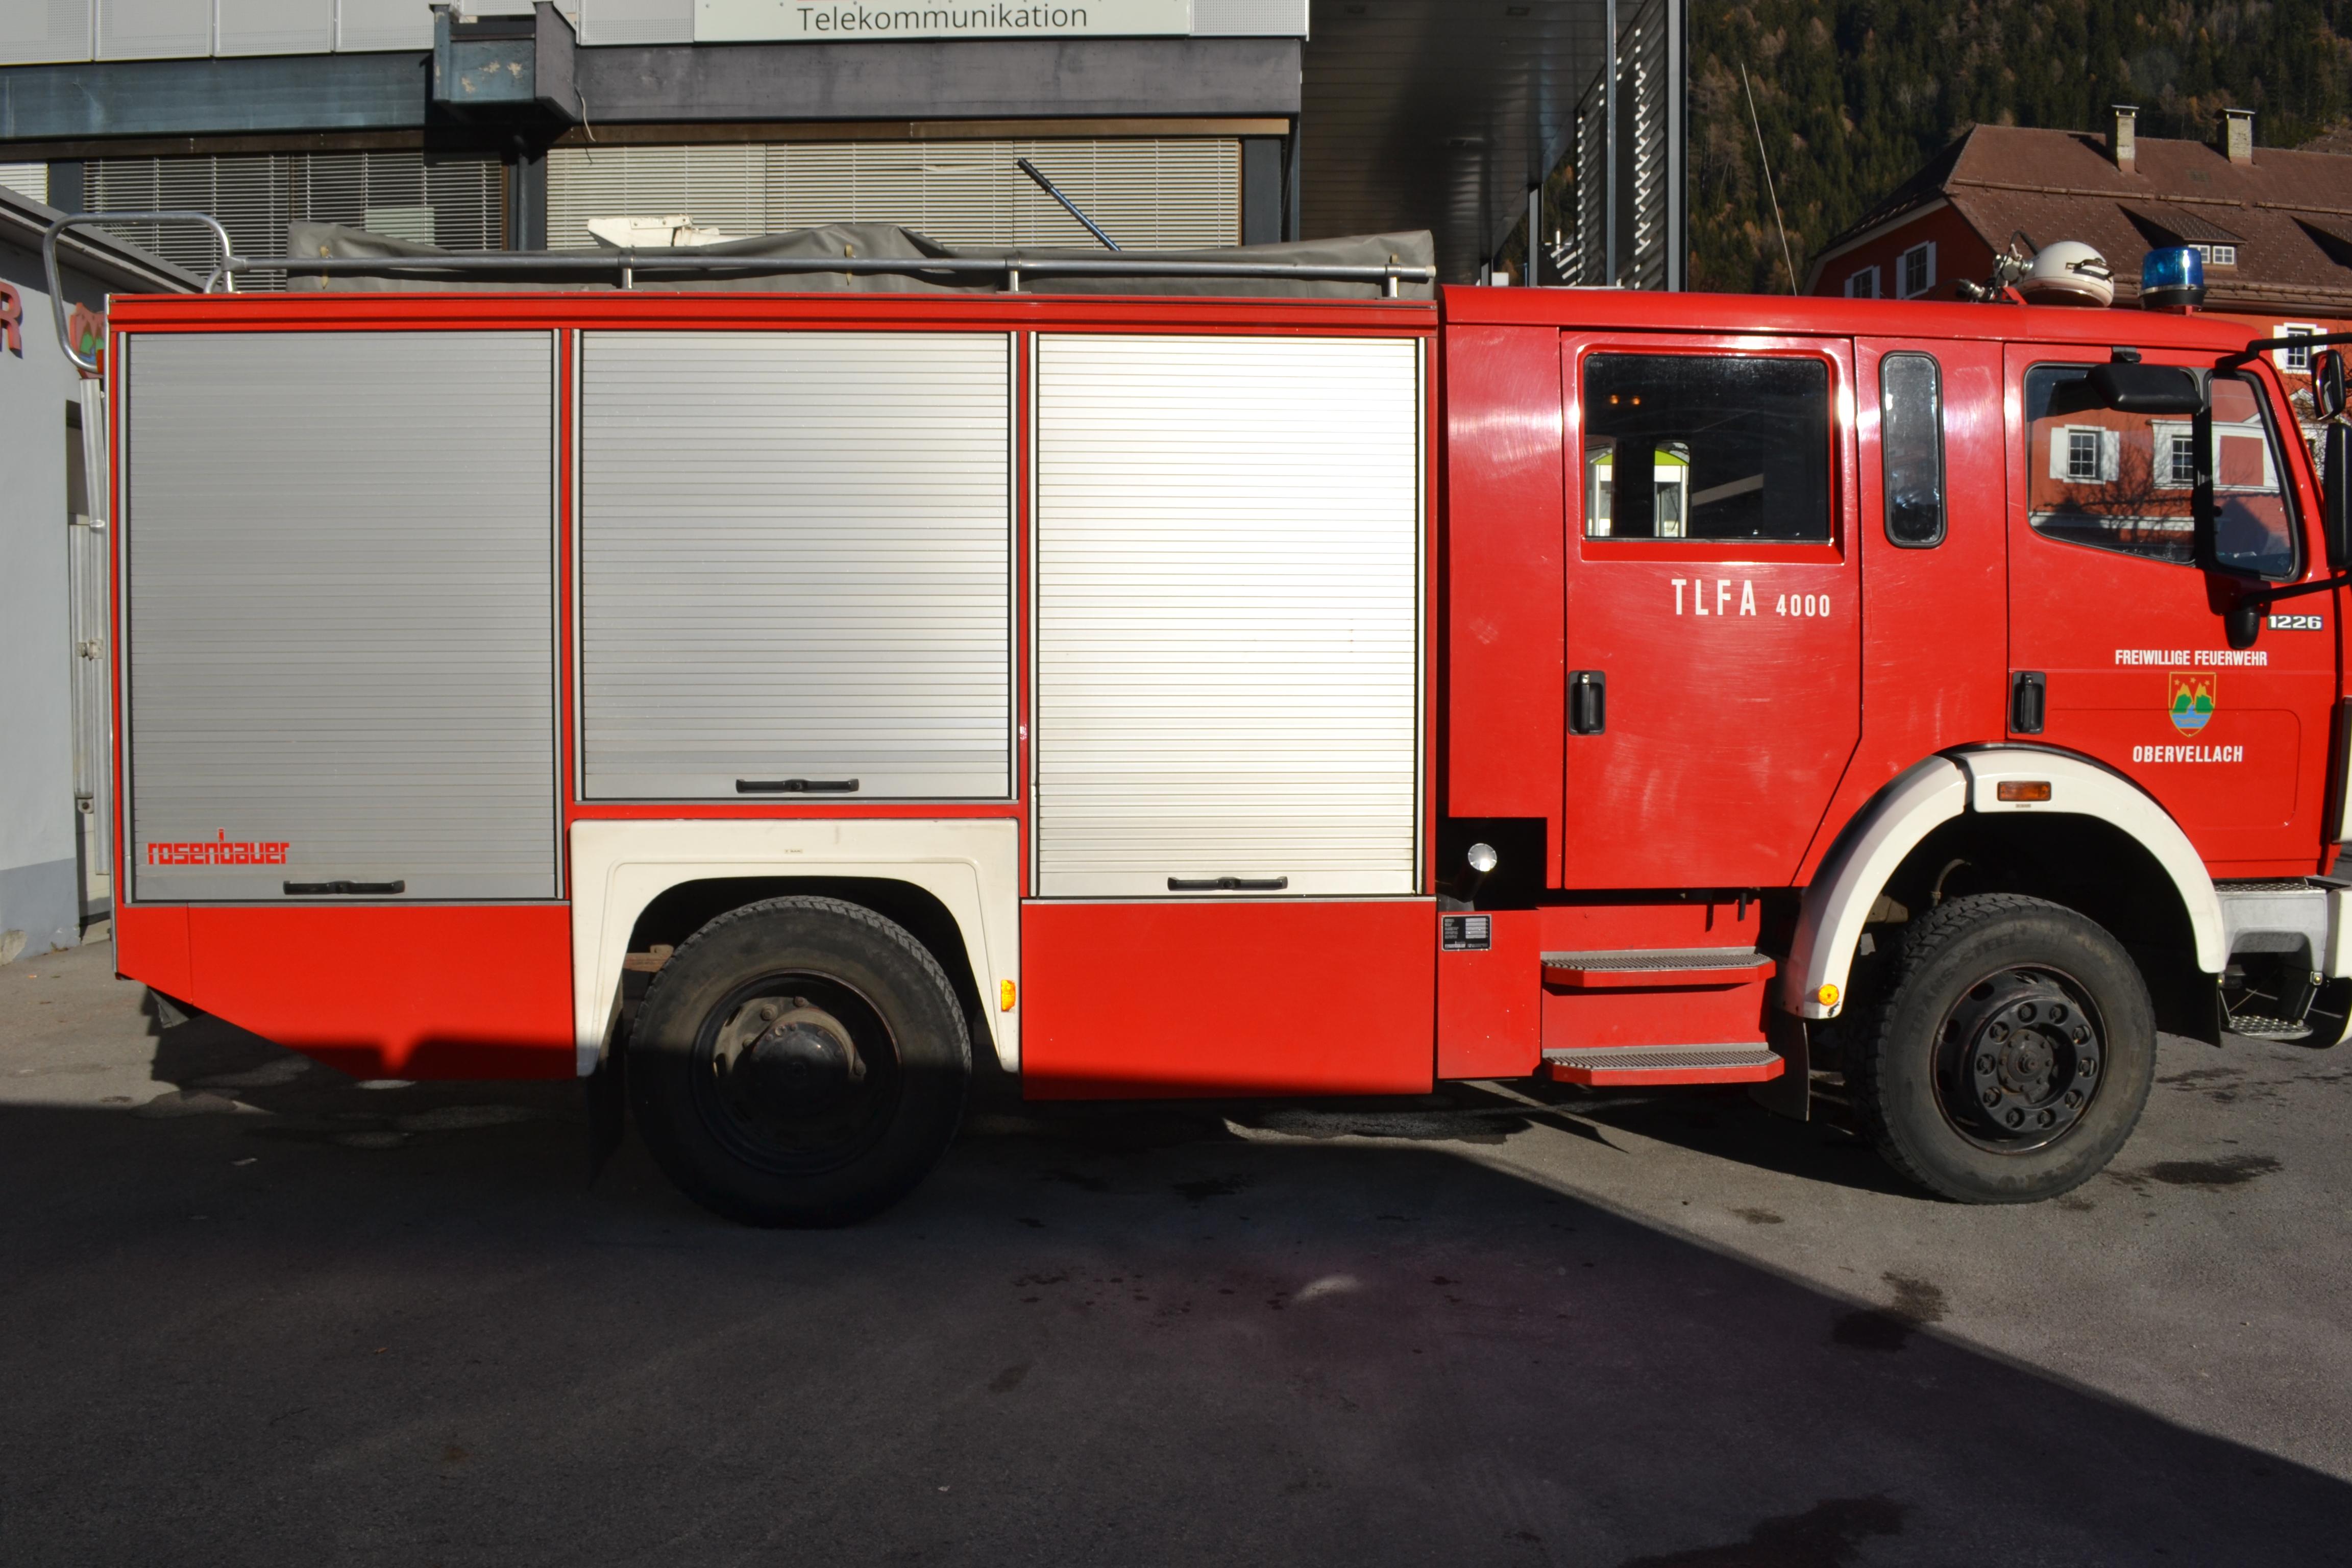 Tanklöschfahrzeug Allrad (TLF-A 4000)